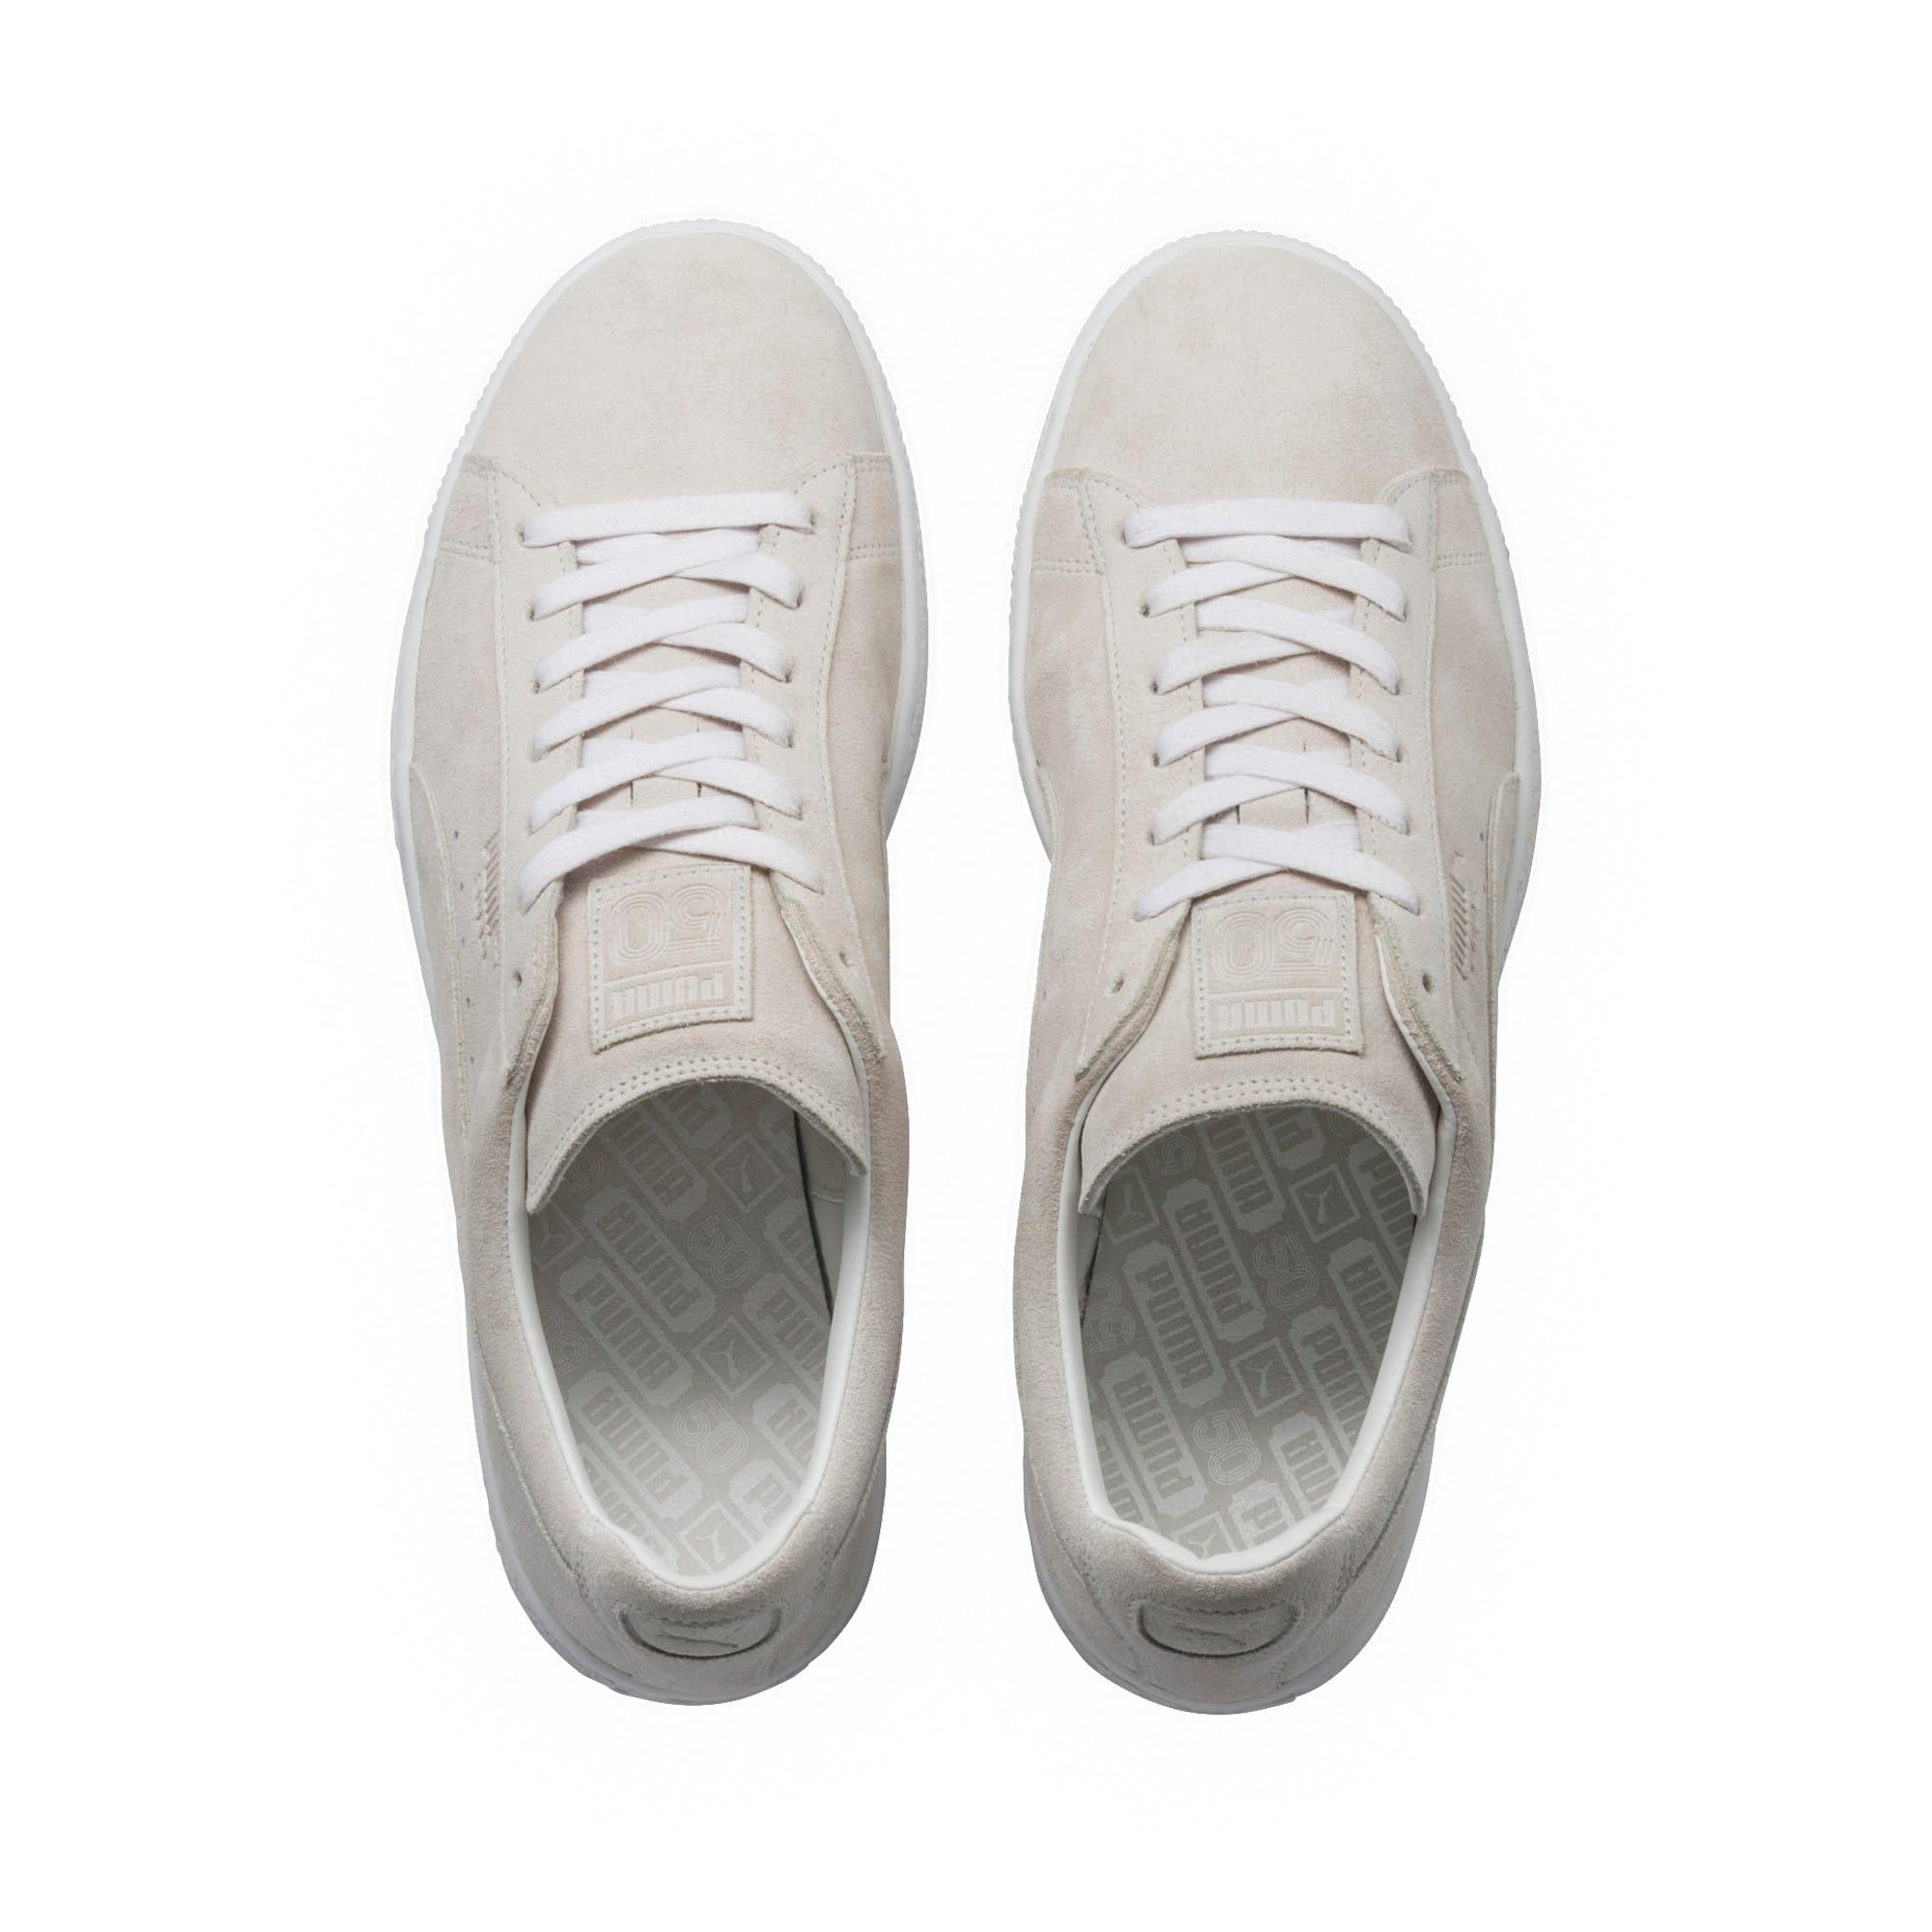 Thumbnail 5 of Suede Classic White Sneakers, Puma White-Puma White, medium